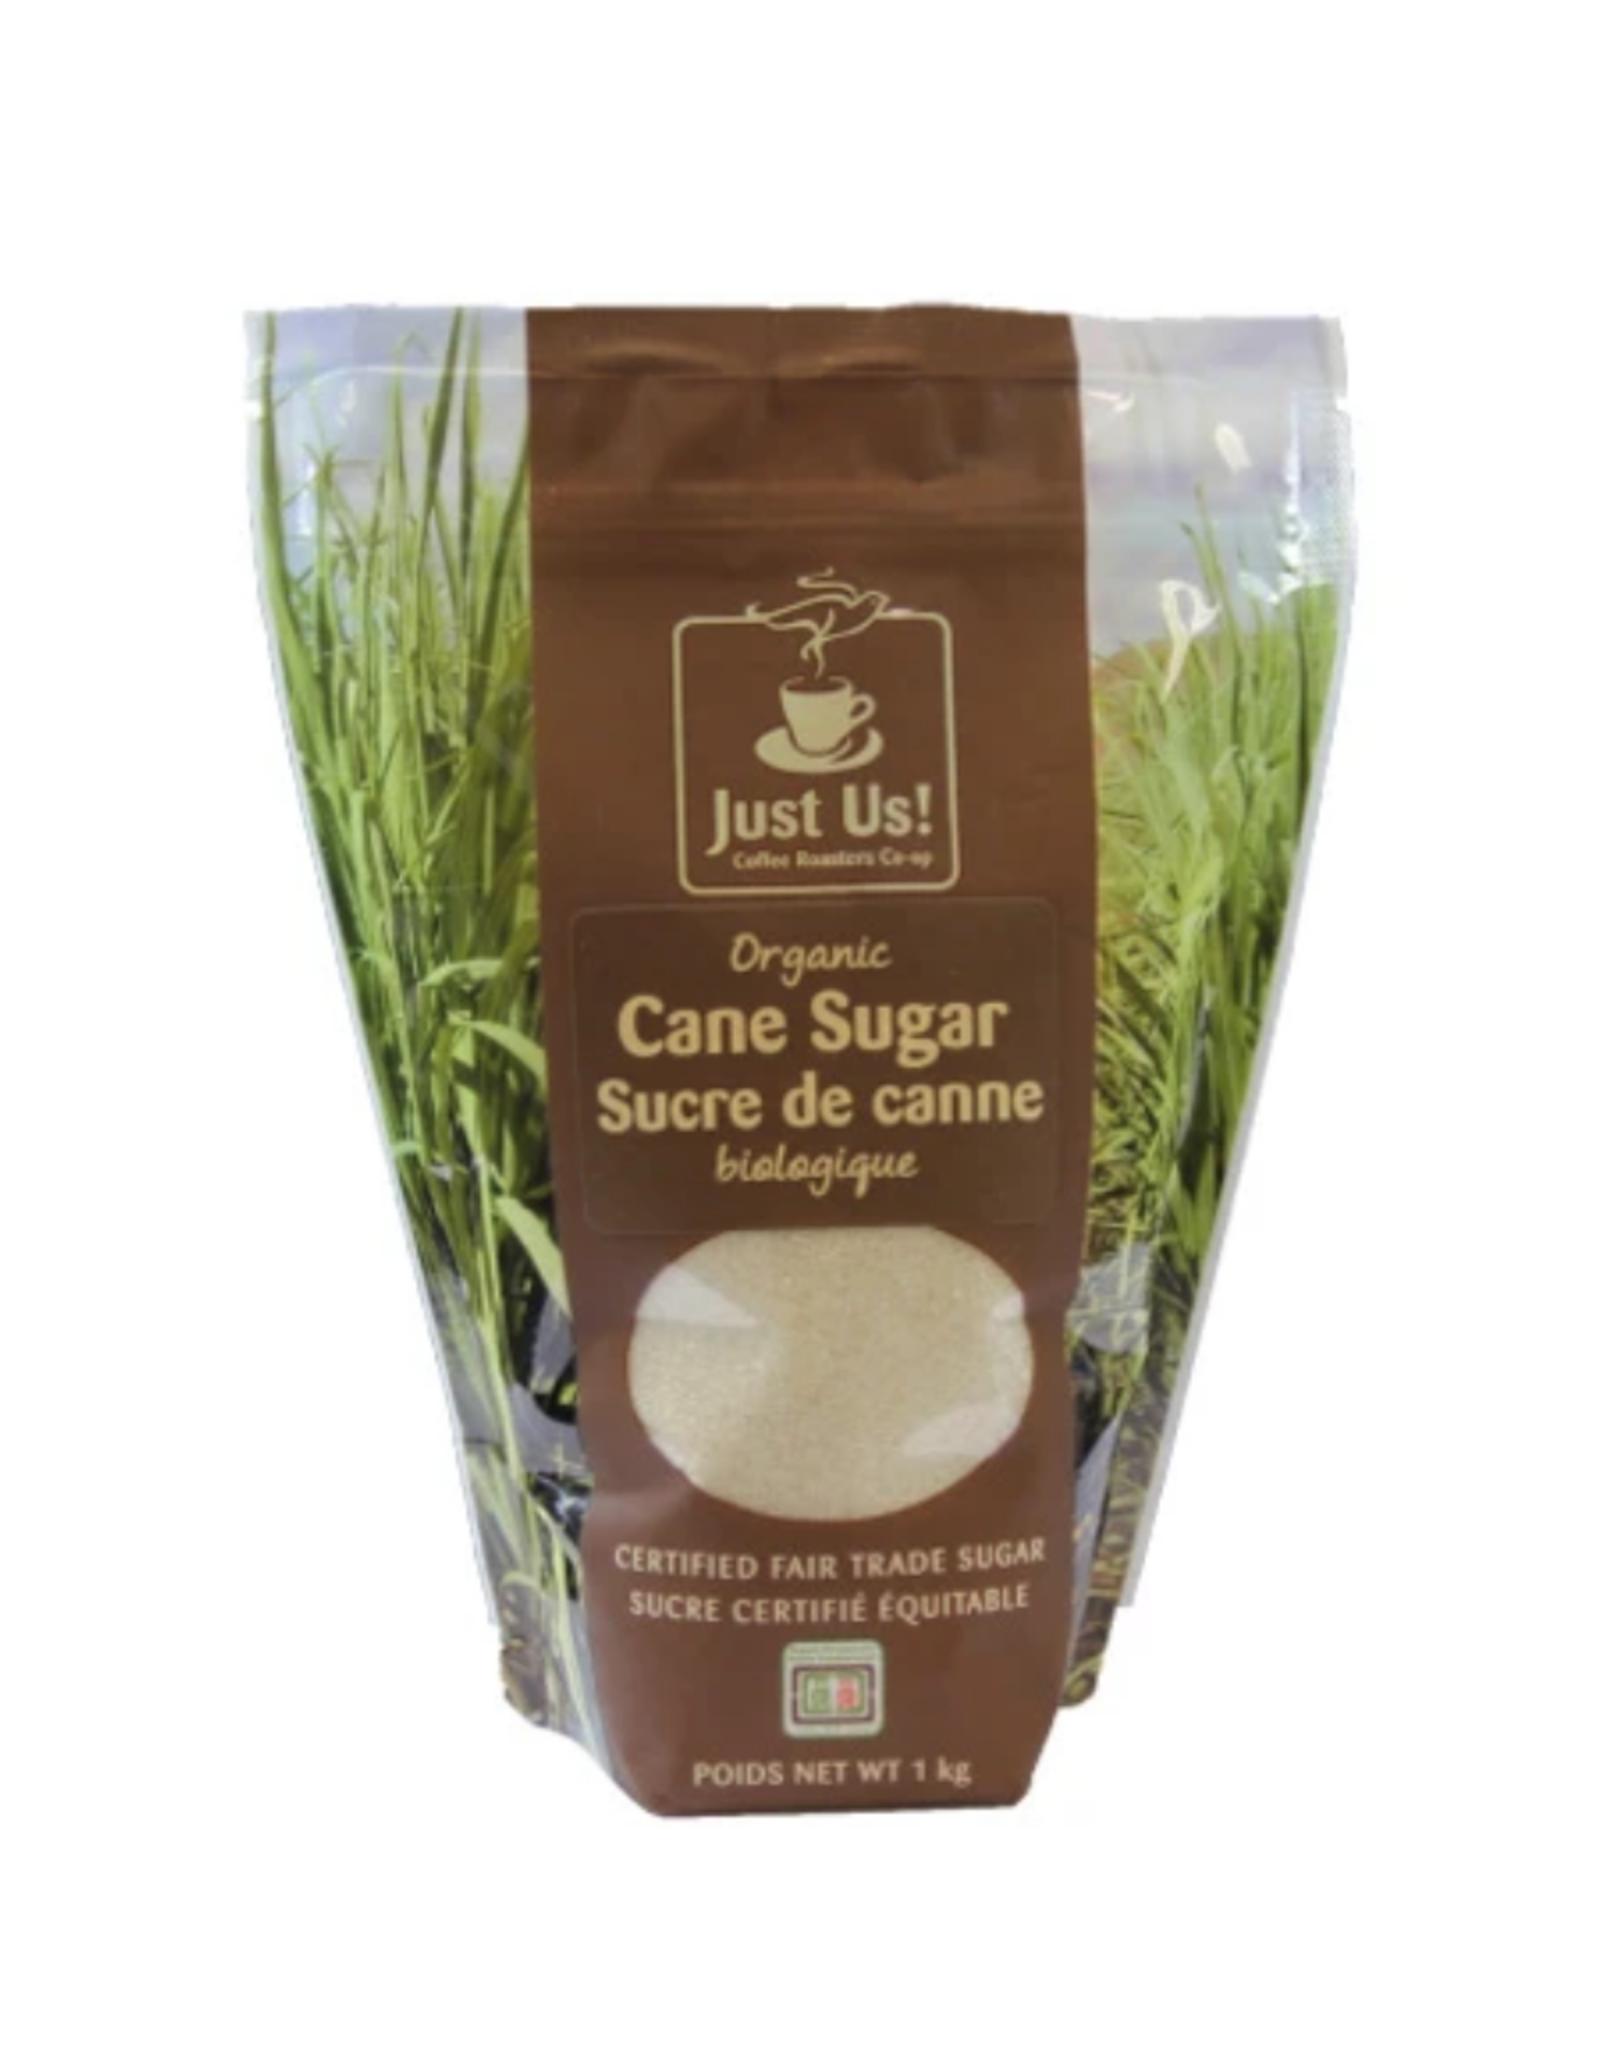 African Essentials Just Us! Organic Cane Sugar, 1kg - Paraguay